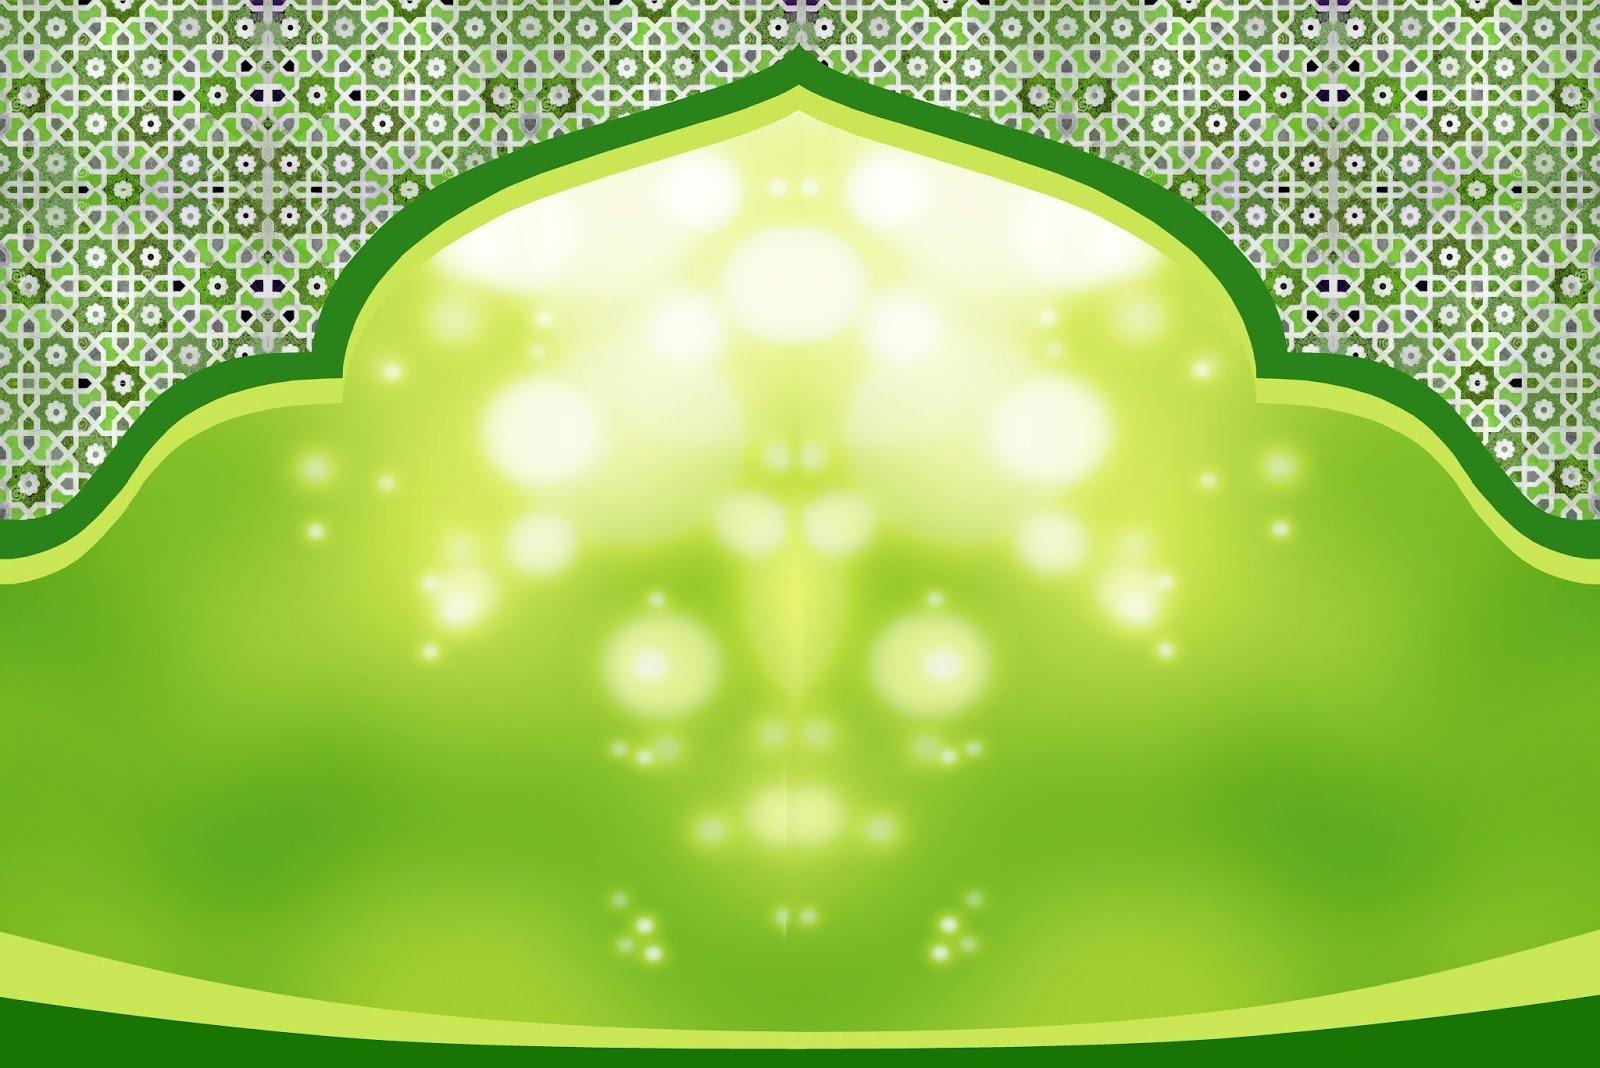 undangan cdr hijau pernikahan Background Islamic   WallpaperSafari